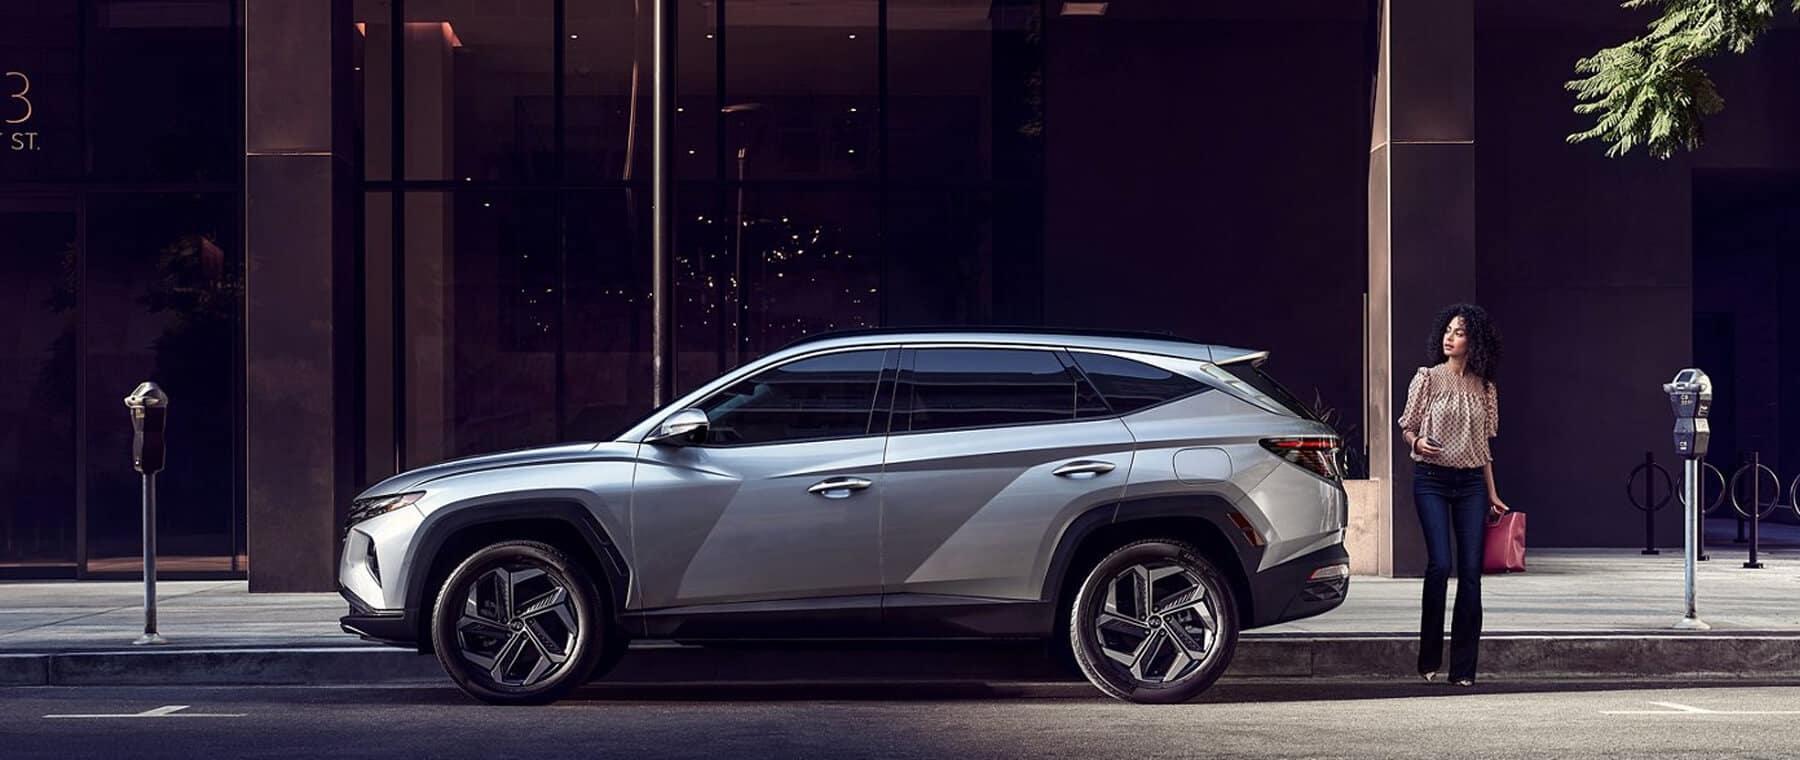 Vern Eide Hyundai Sioux City 2022 Tucson Homepage Image